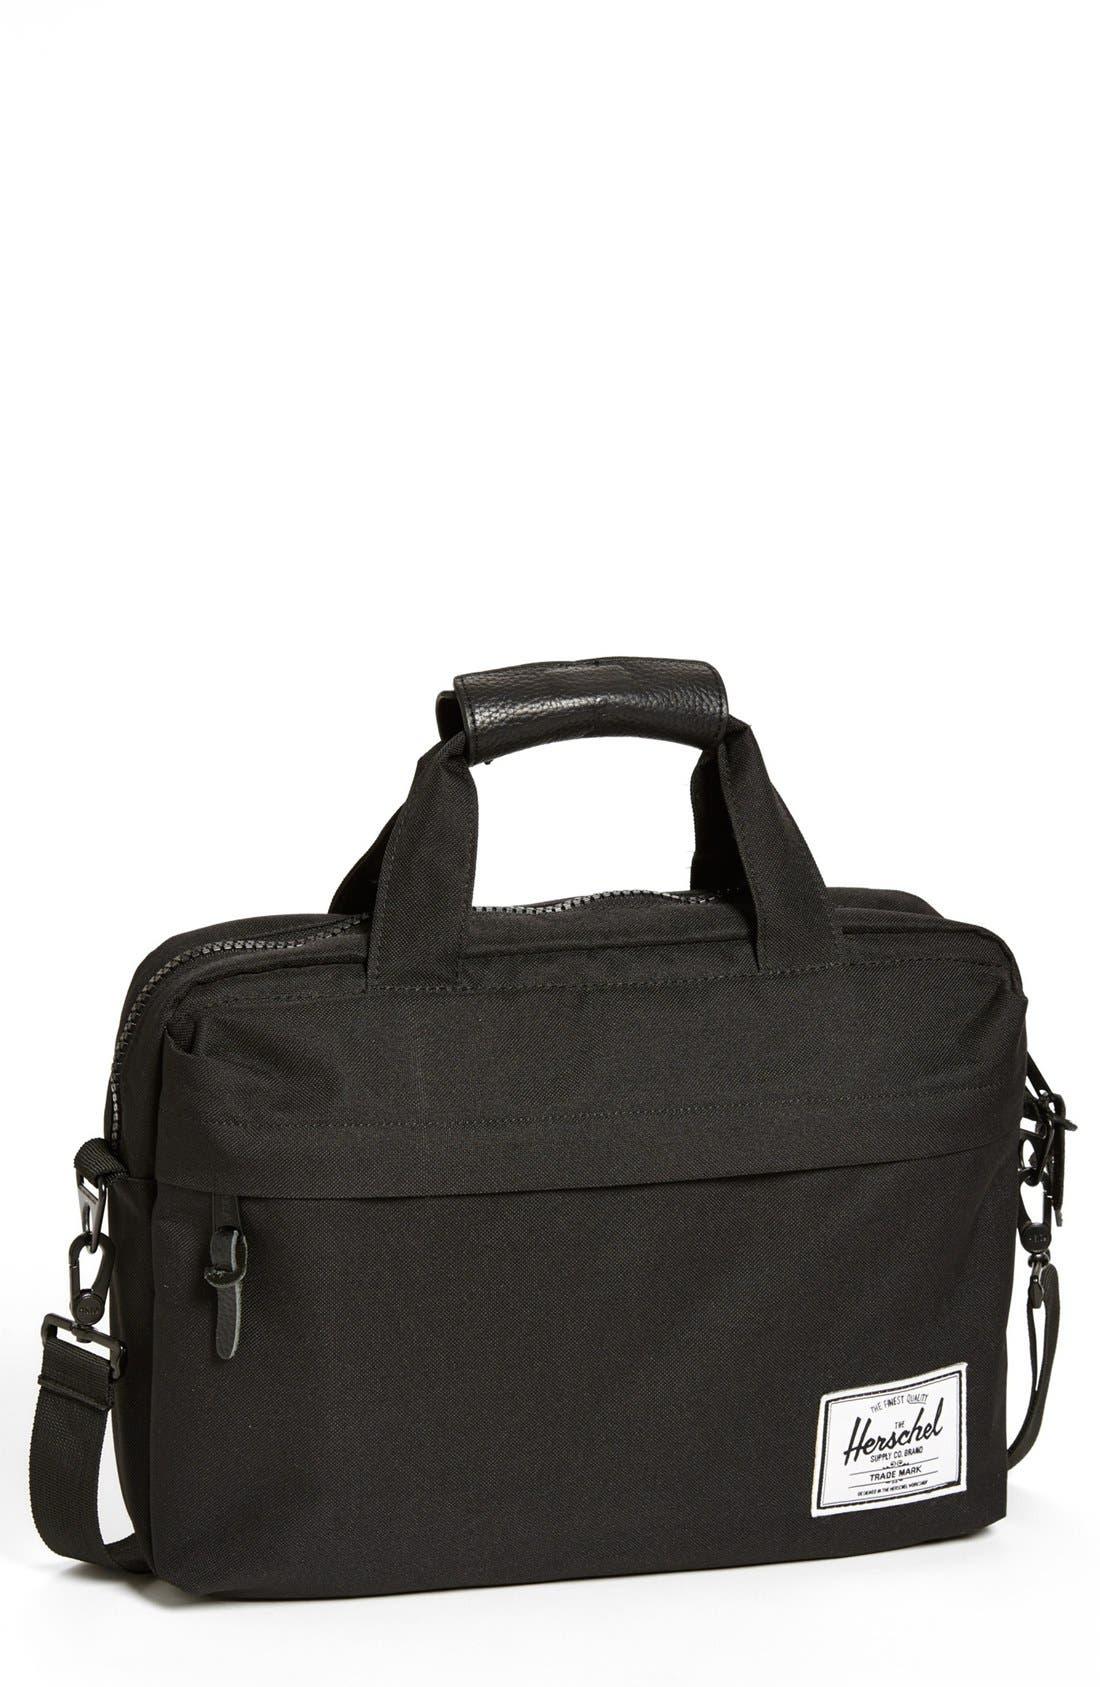 Alternate Image 1 Selected - Herschel Supply Co. 'Clark' Messenger Bag